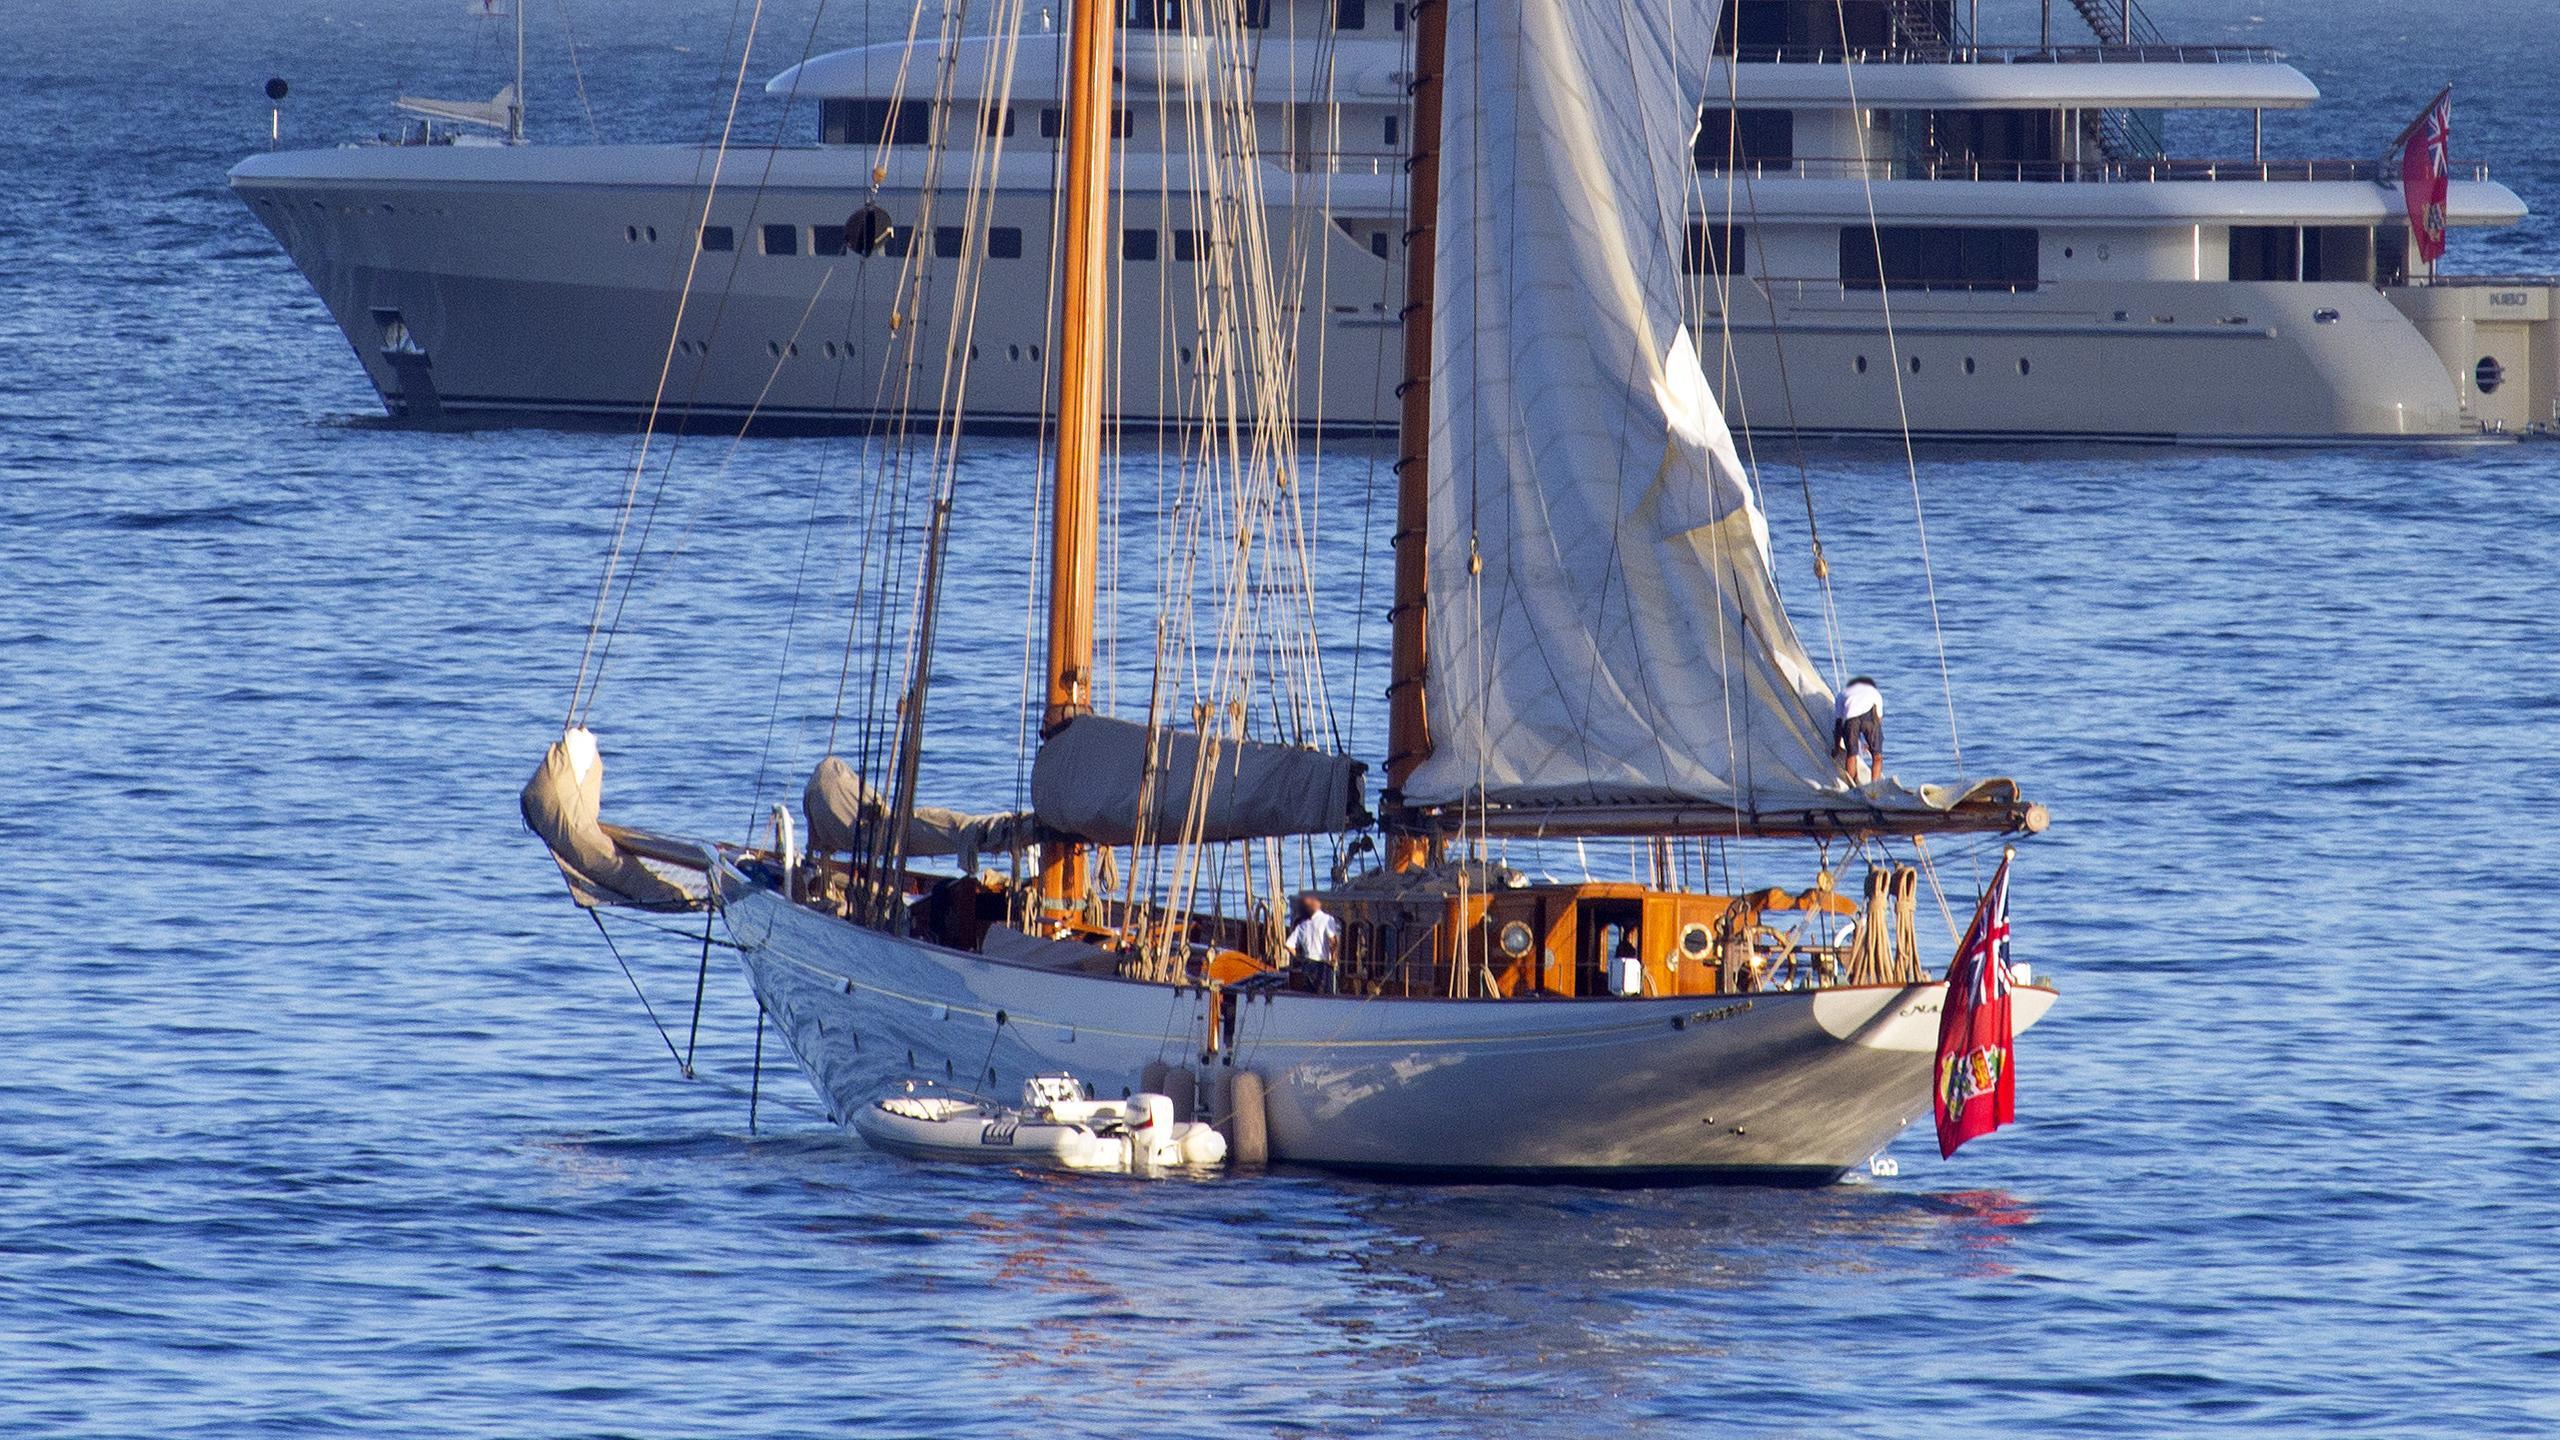 naema-sailing-yacht-graafship-2013-39m-half-stern